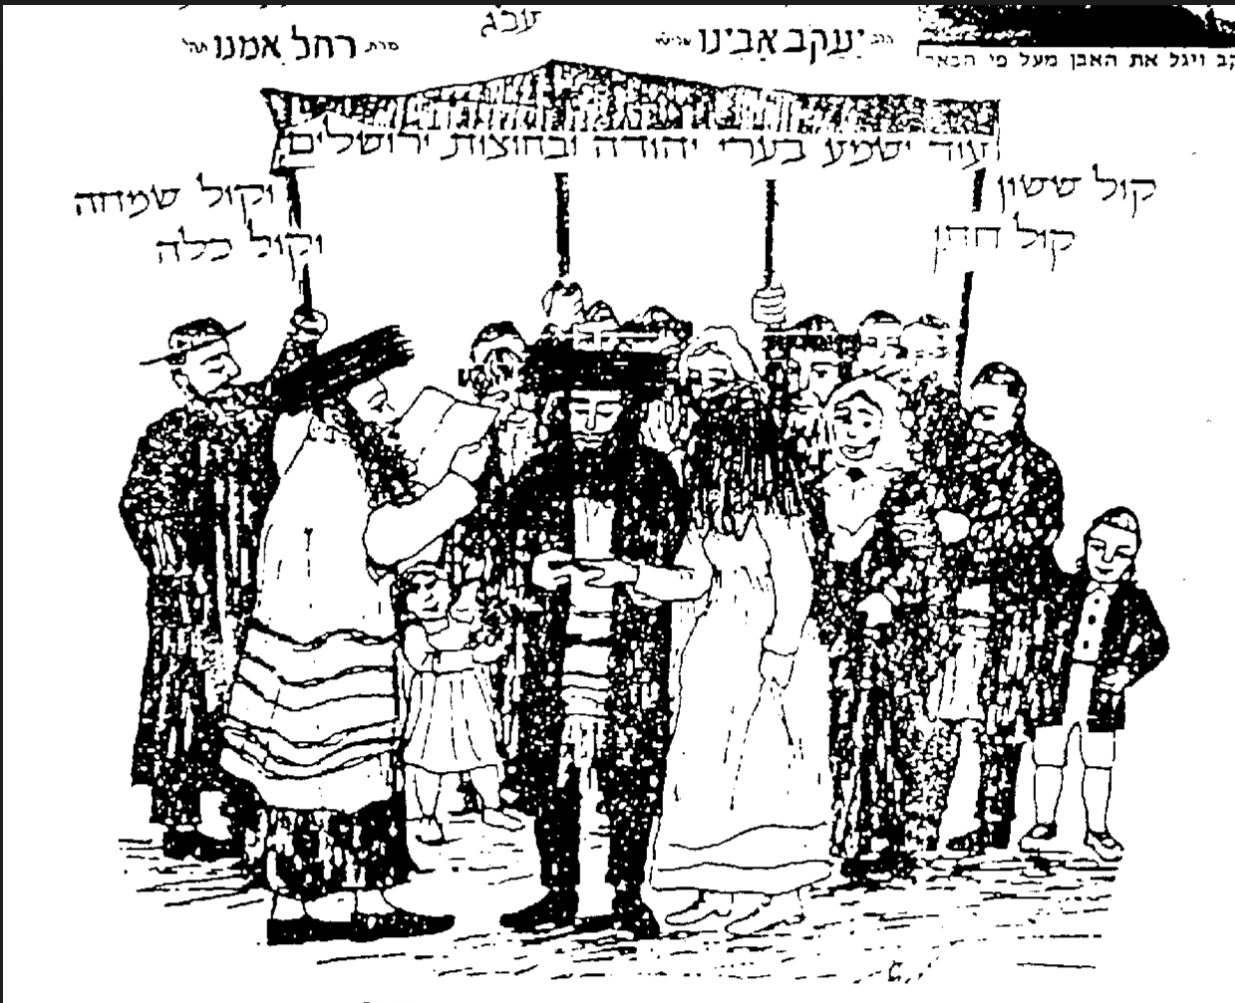 Focus on Judaism, not Silliness